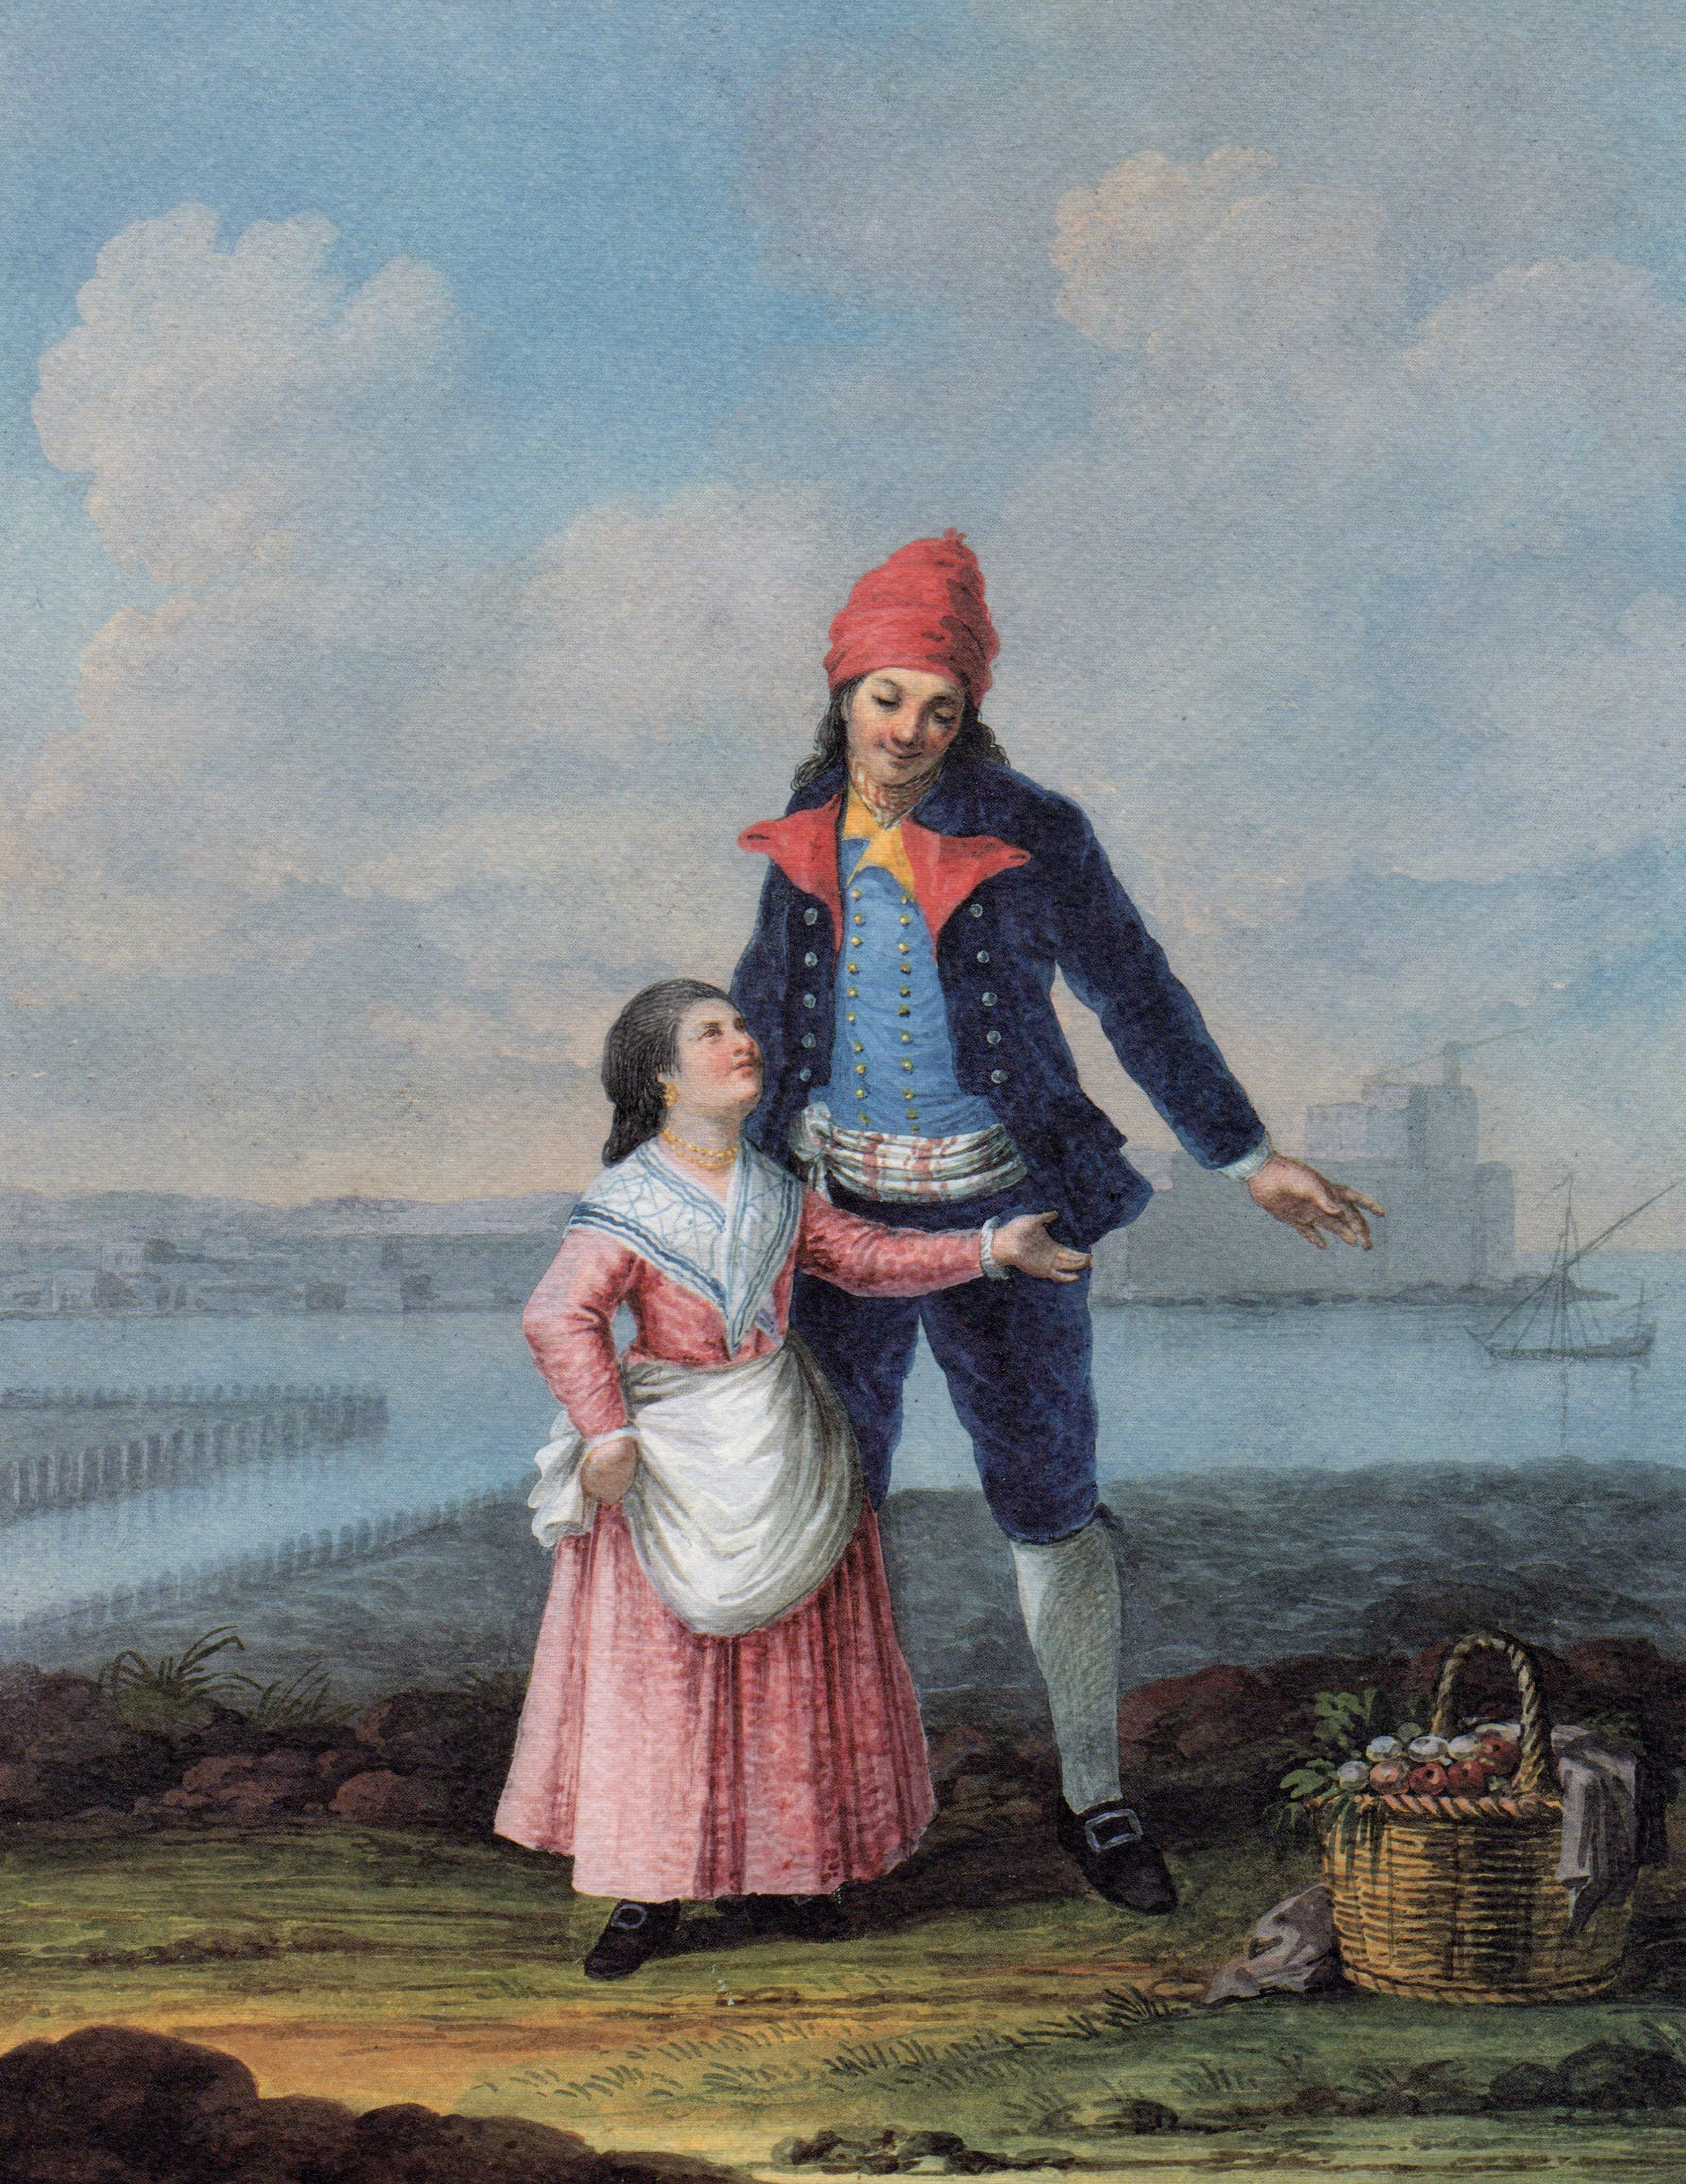 Un matrimonio del 1800!